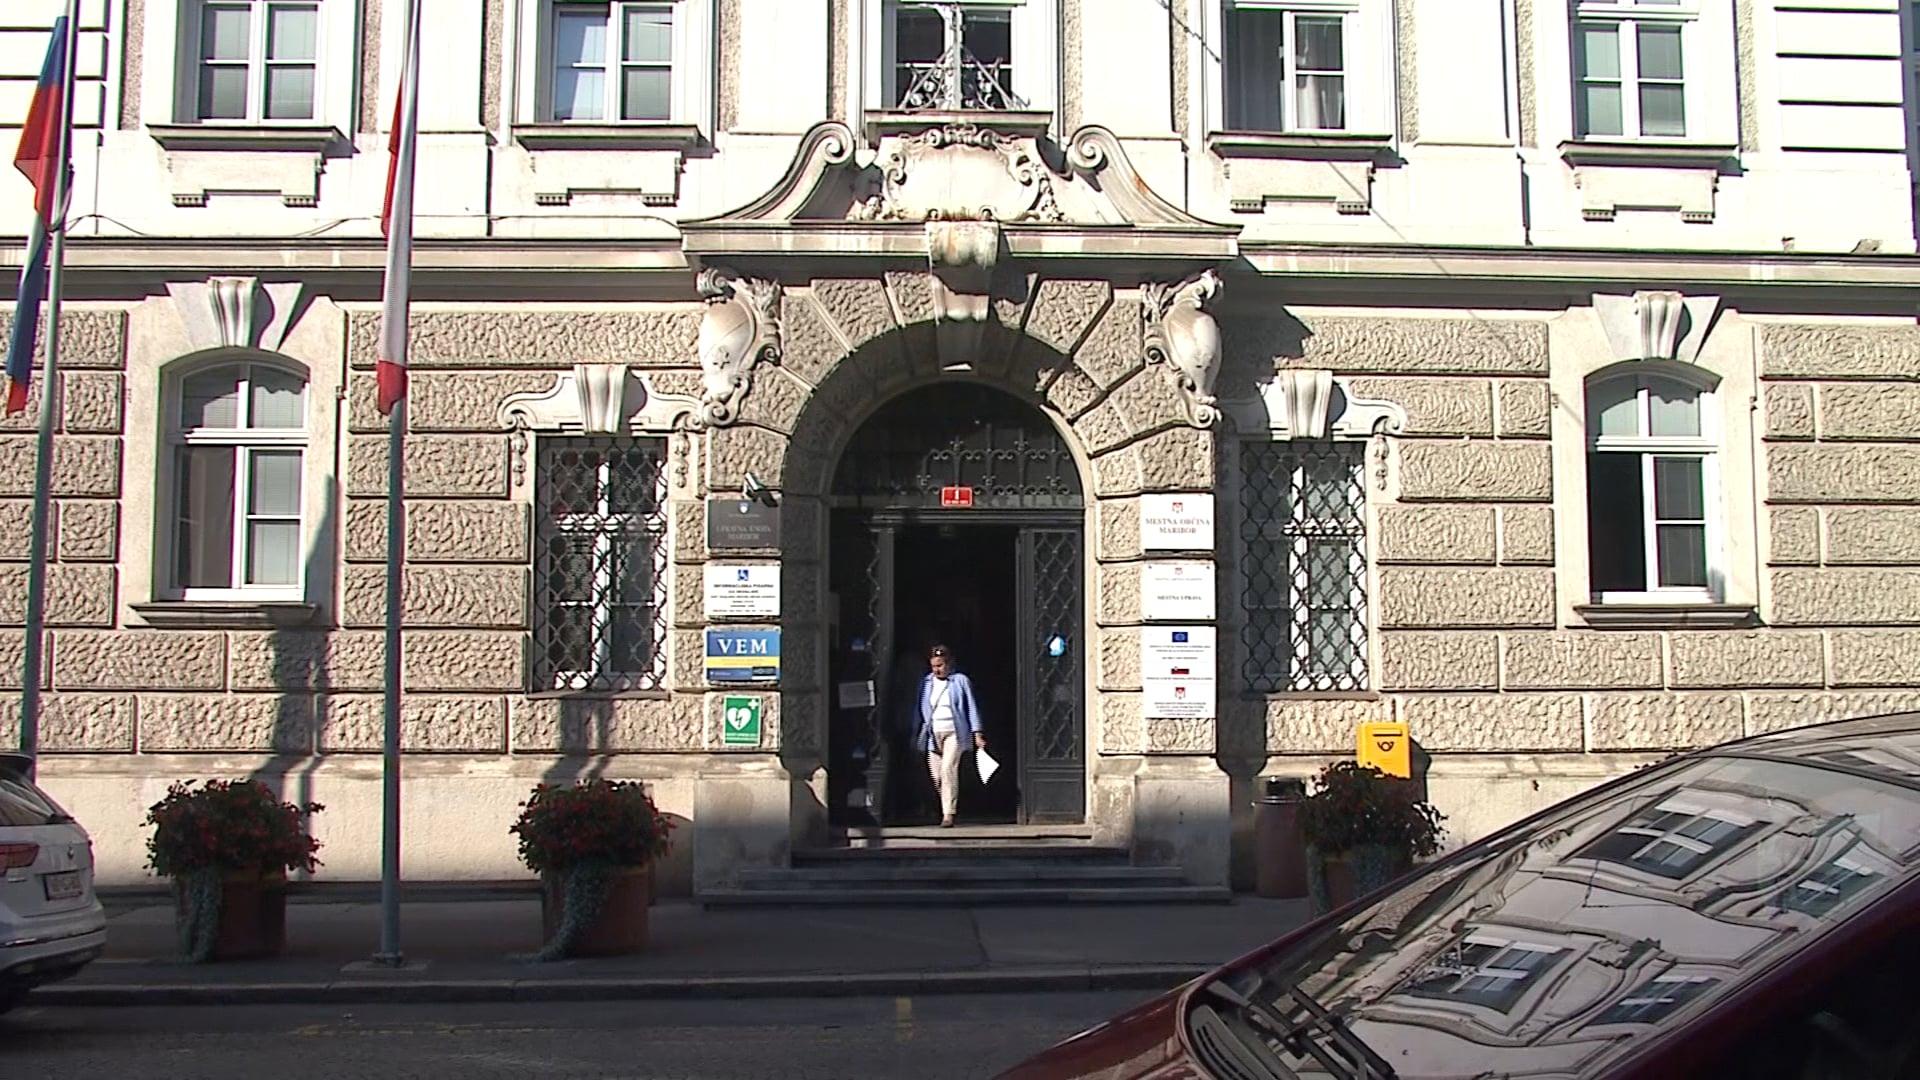 Zaživela je skupna občinska uprava Maribor